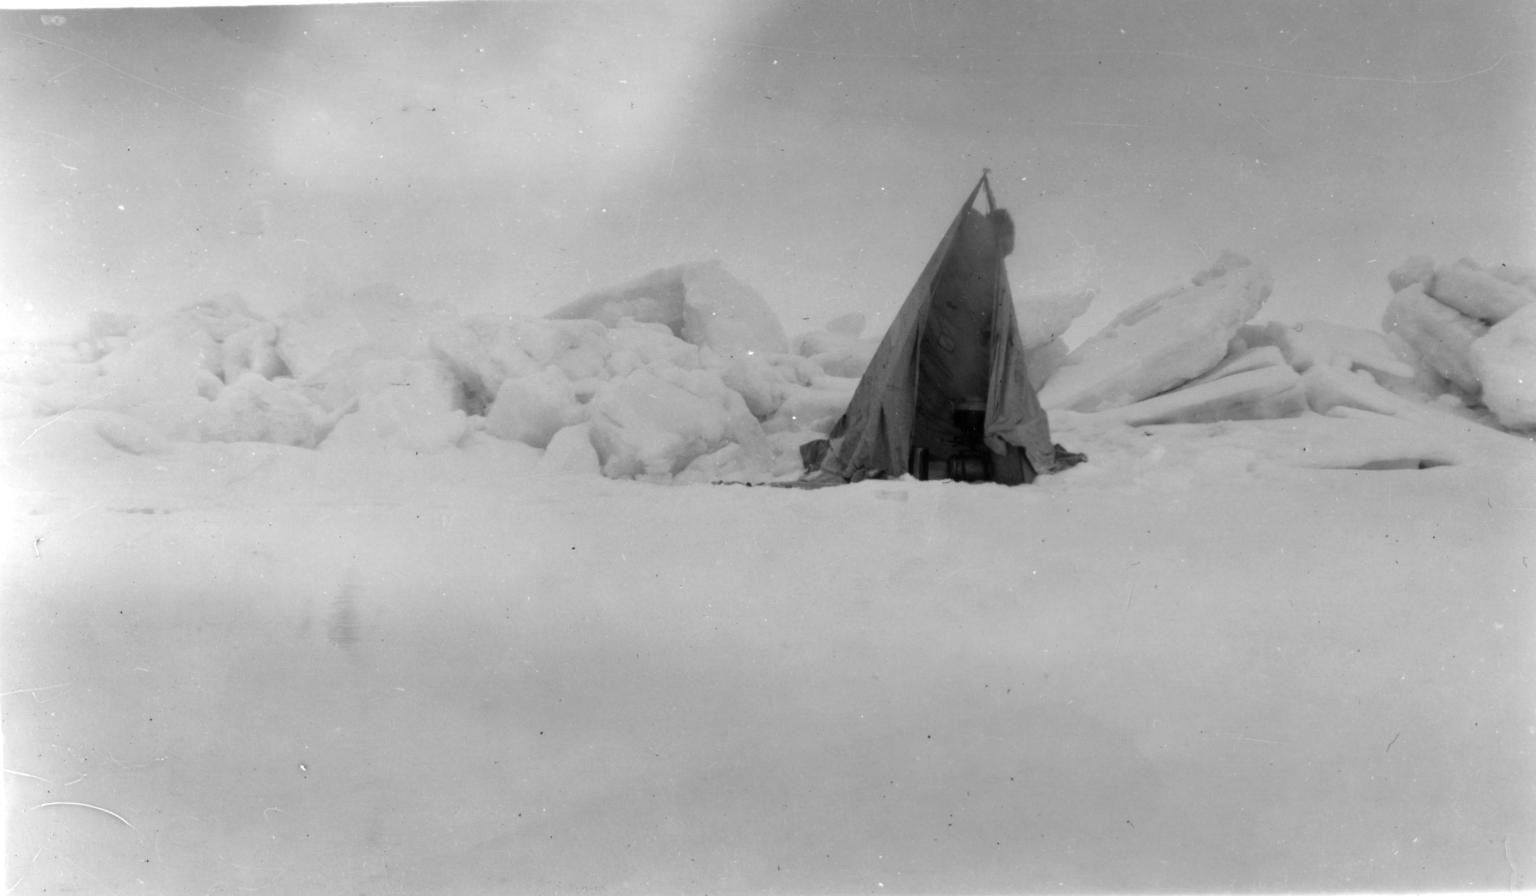 Whaler's Camp